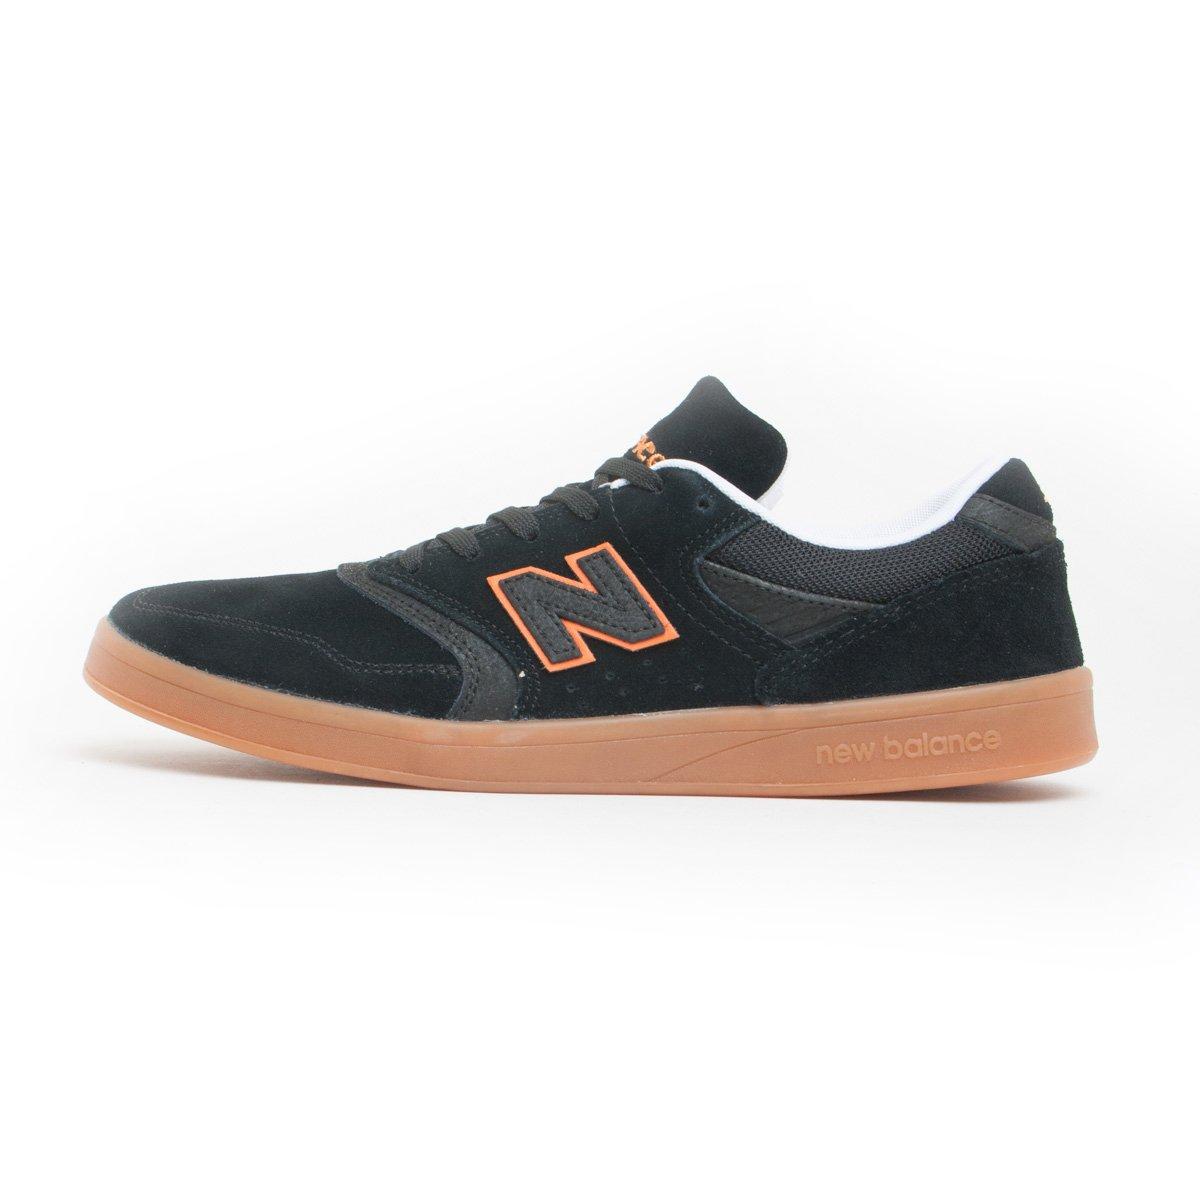 new balance pro skate